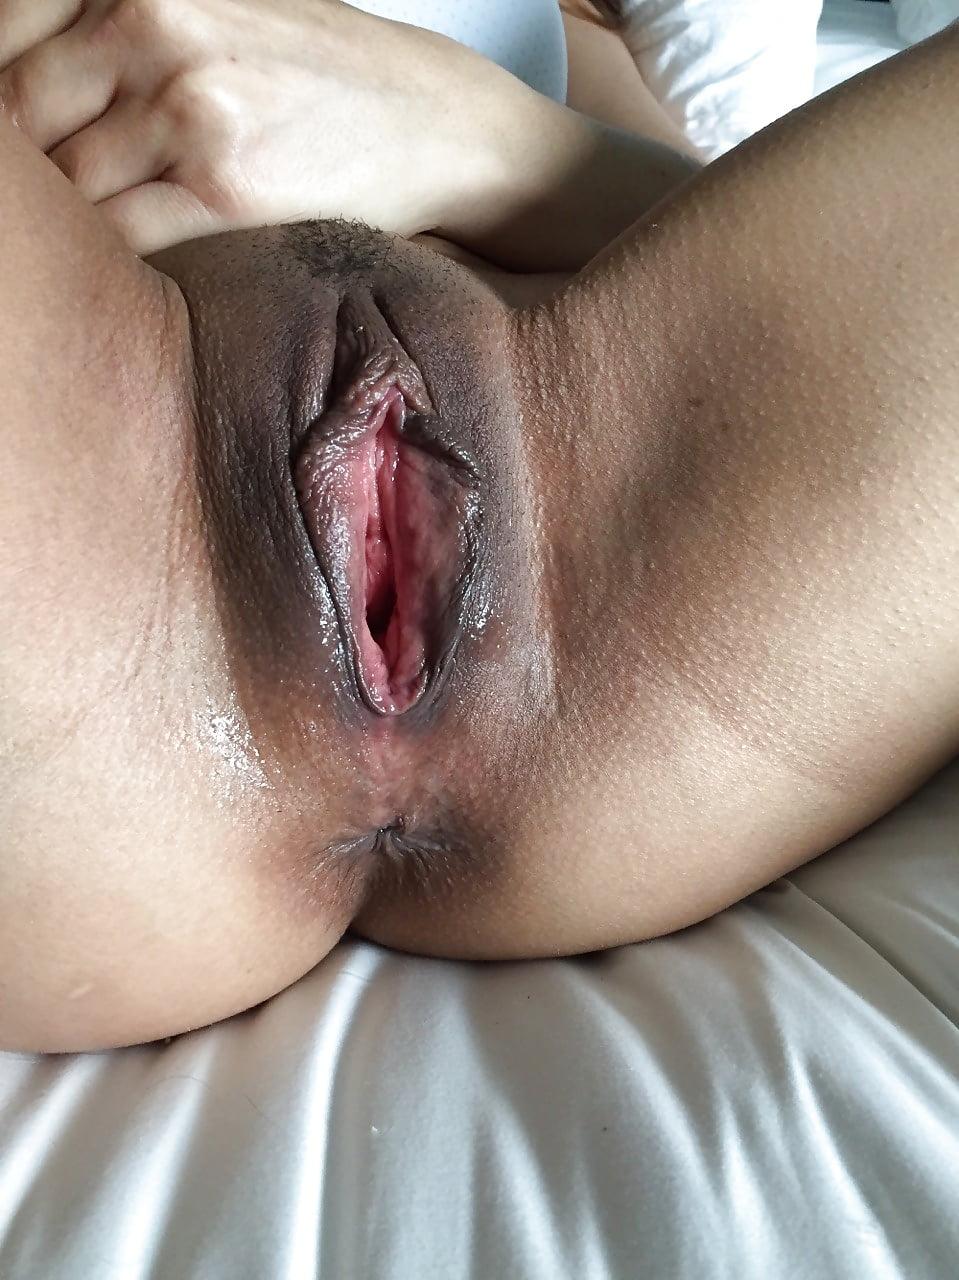 Horny girl masturbates pussy watching porn then